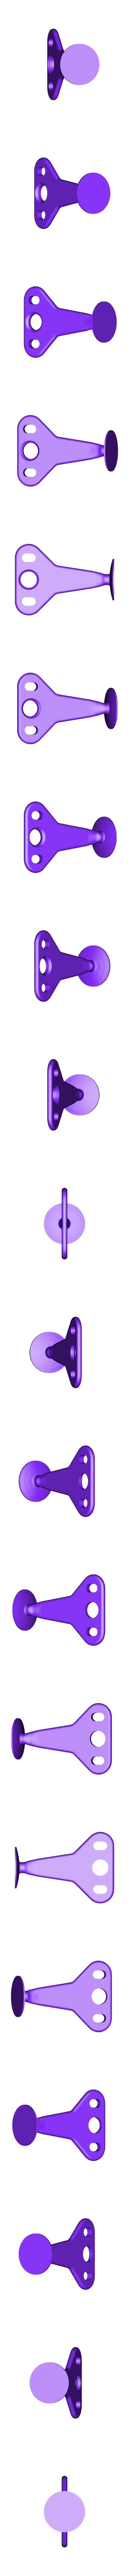 Hanging_HookRev_1.stl Download free STL file Note 2 Dash Cam Mount • 3D printing template, Raeunn3D